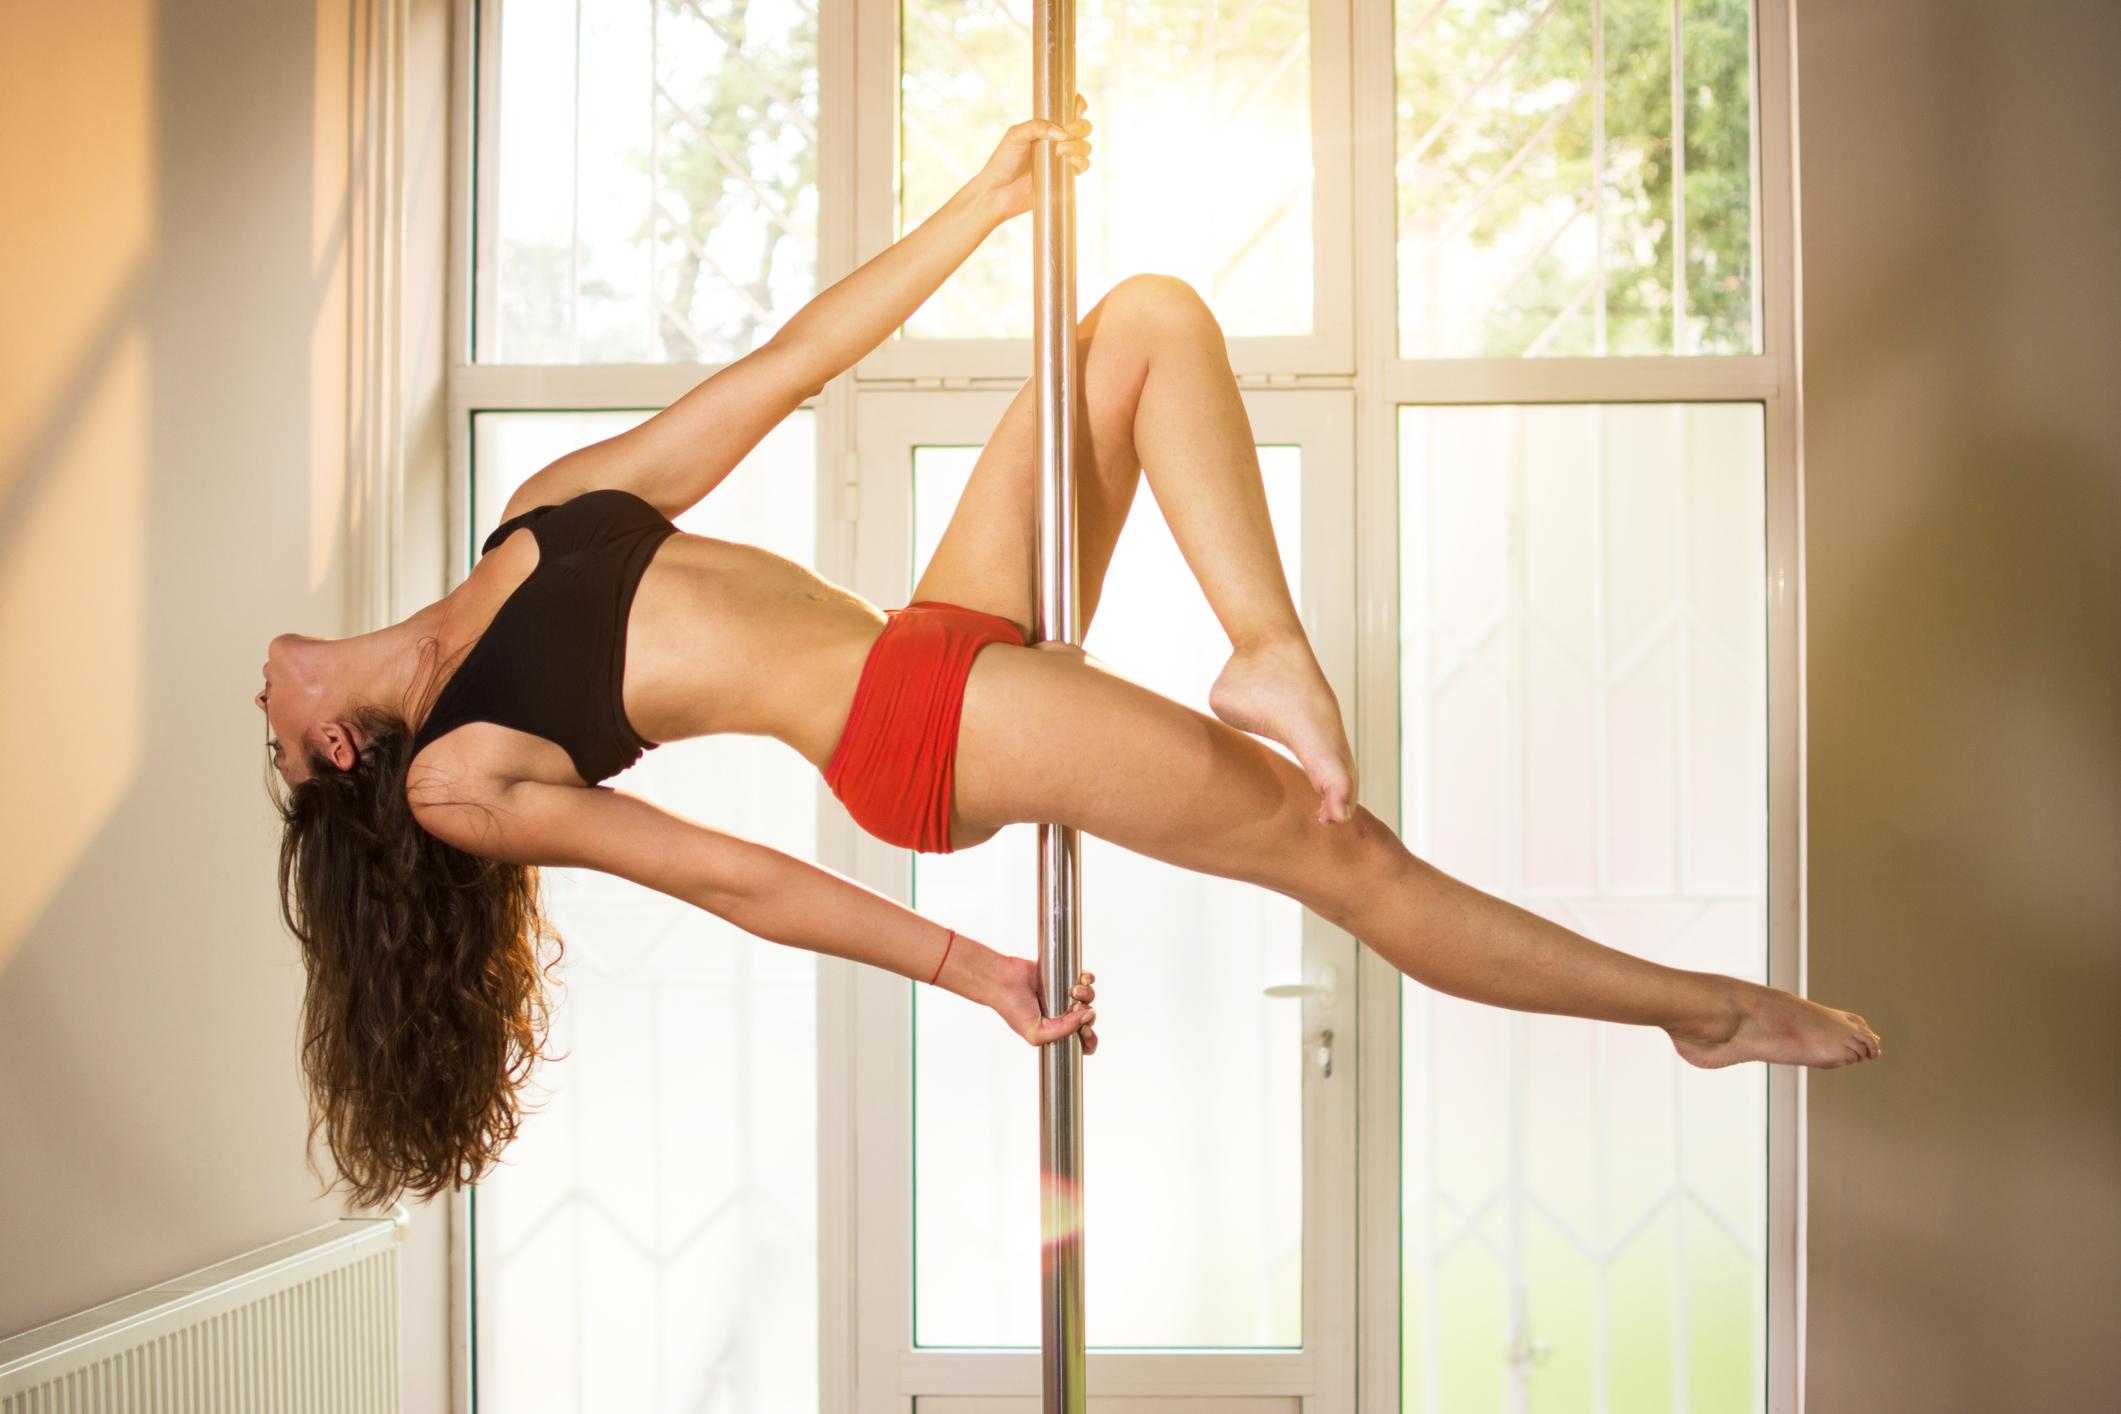 Generic photo of woman pole dancing (Thinkstock/PA)